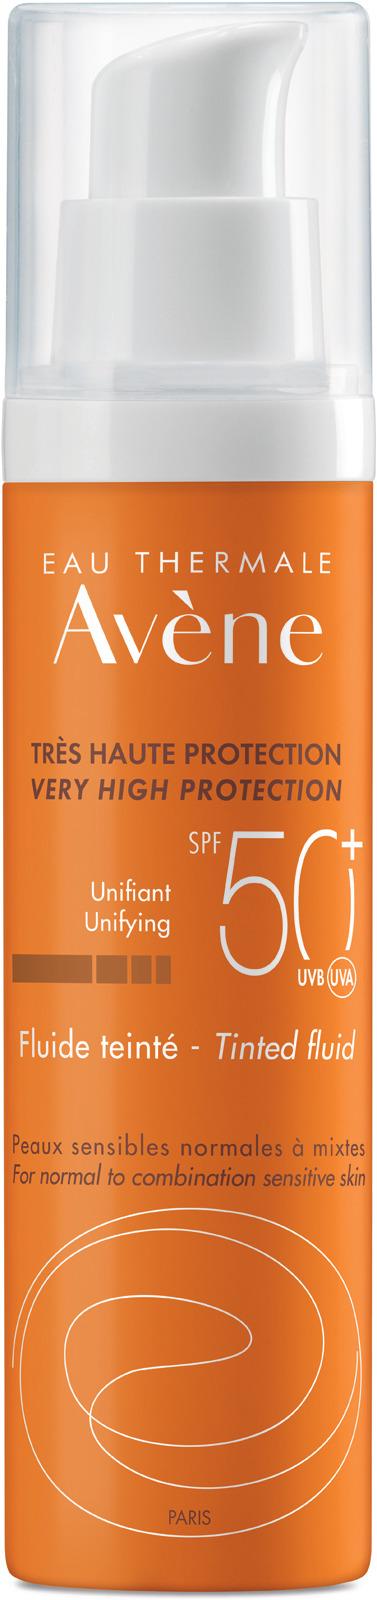 Солнцезащитный флюид Avene, тонирующий, SPF 50+, 50 мл крем от загара avene 50